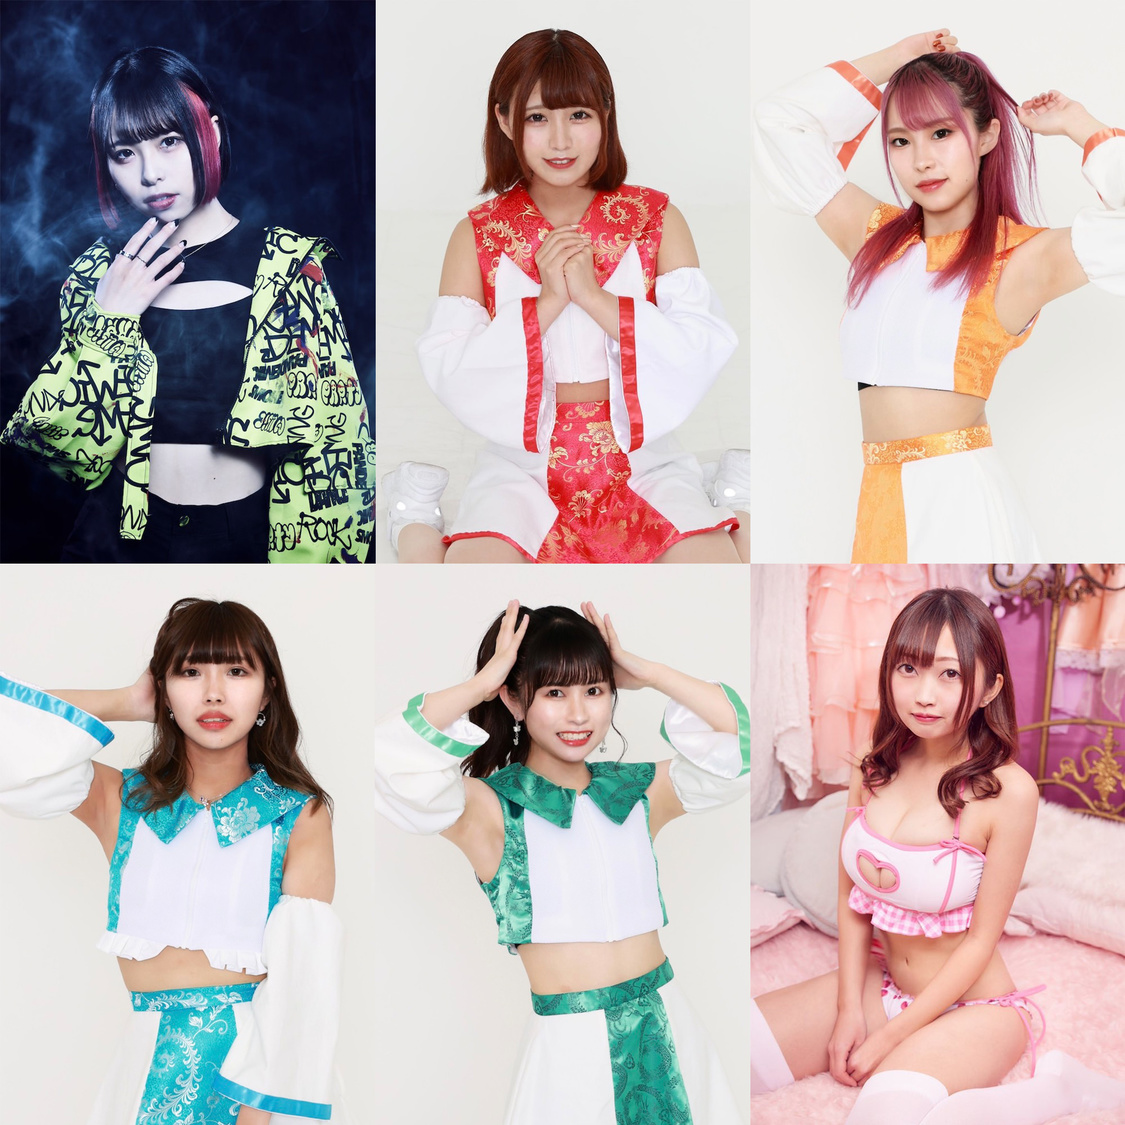 GANGDEMIC&点染テンセイ少女。&レイドロイド、傾奇隊より6名が正式メンバーに昇格!